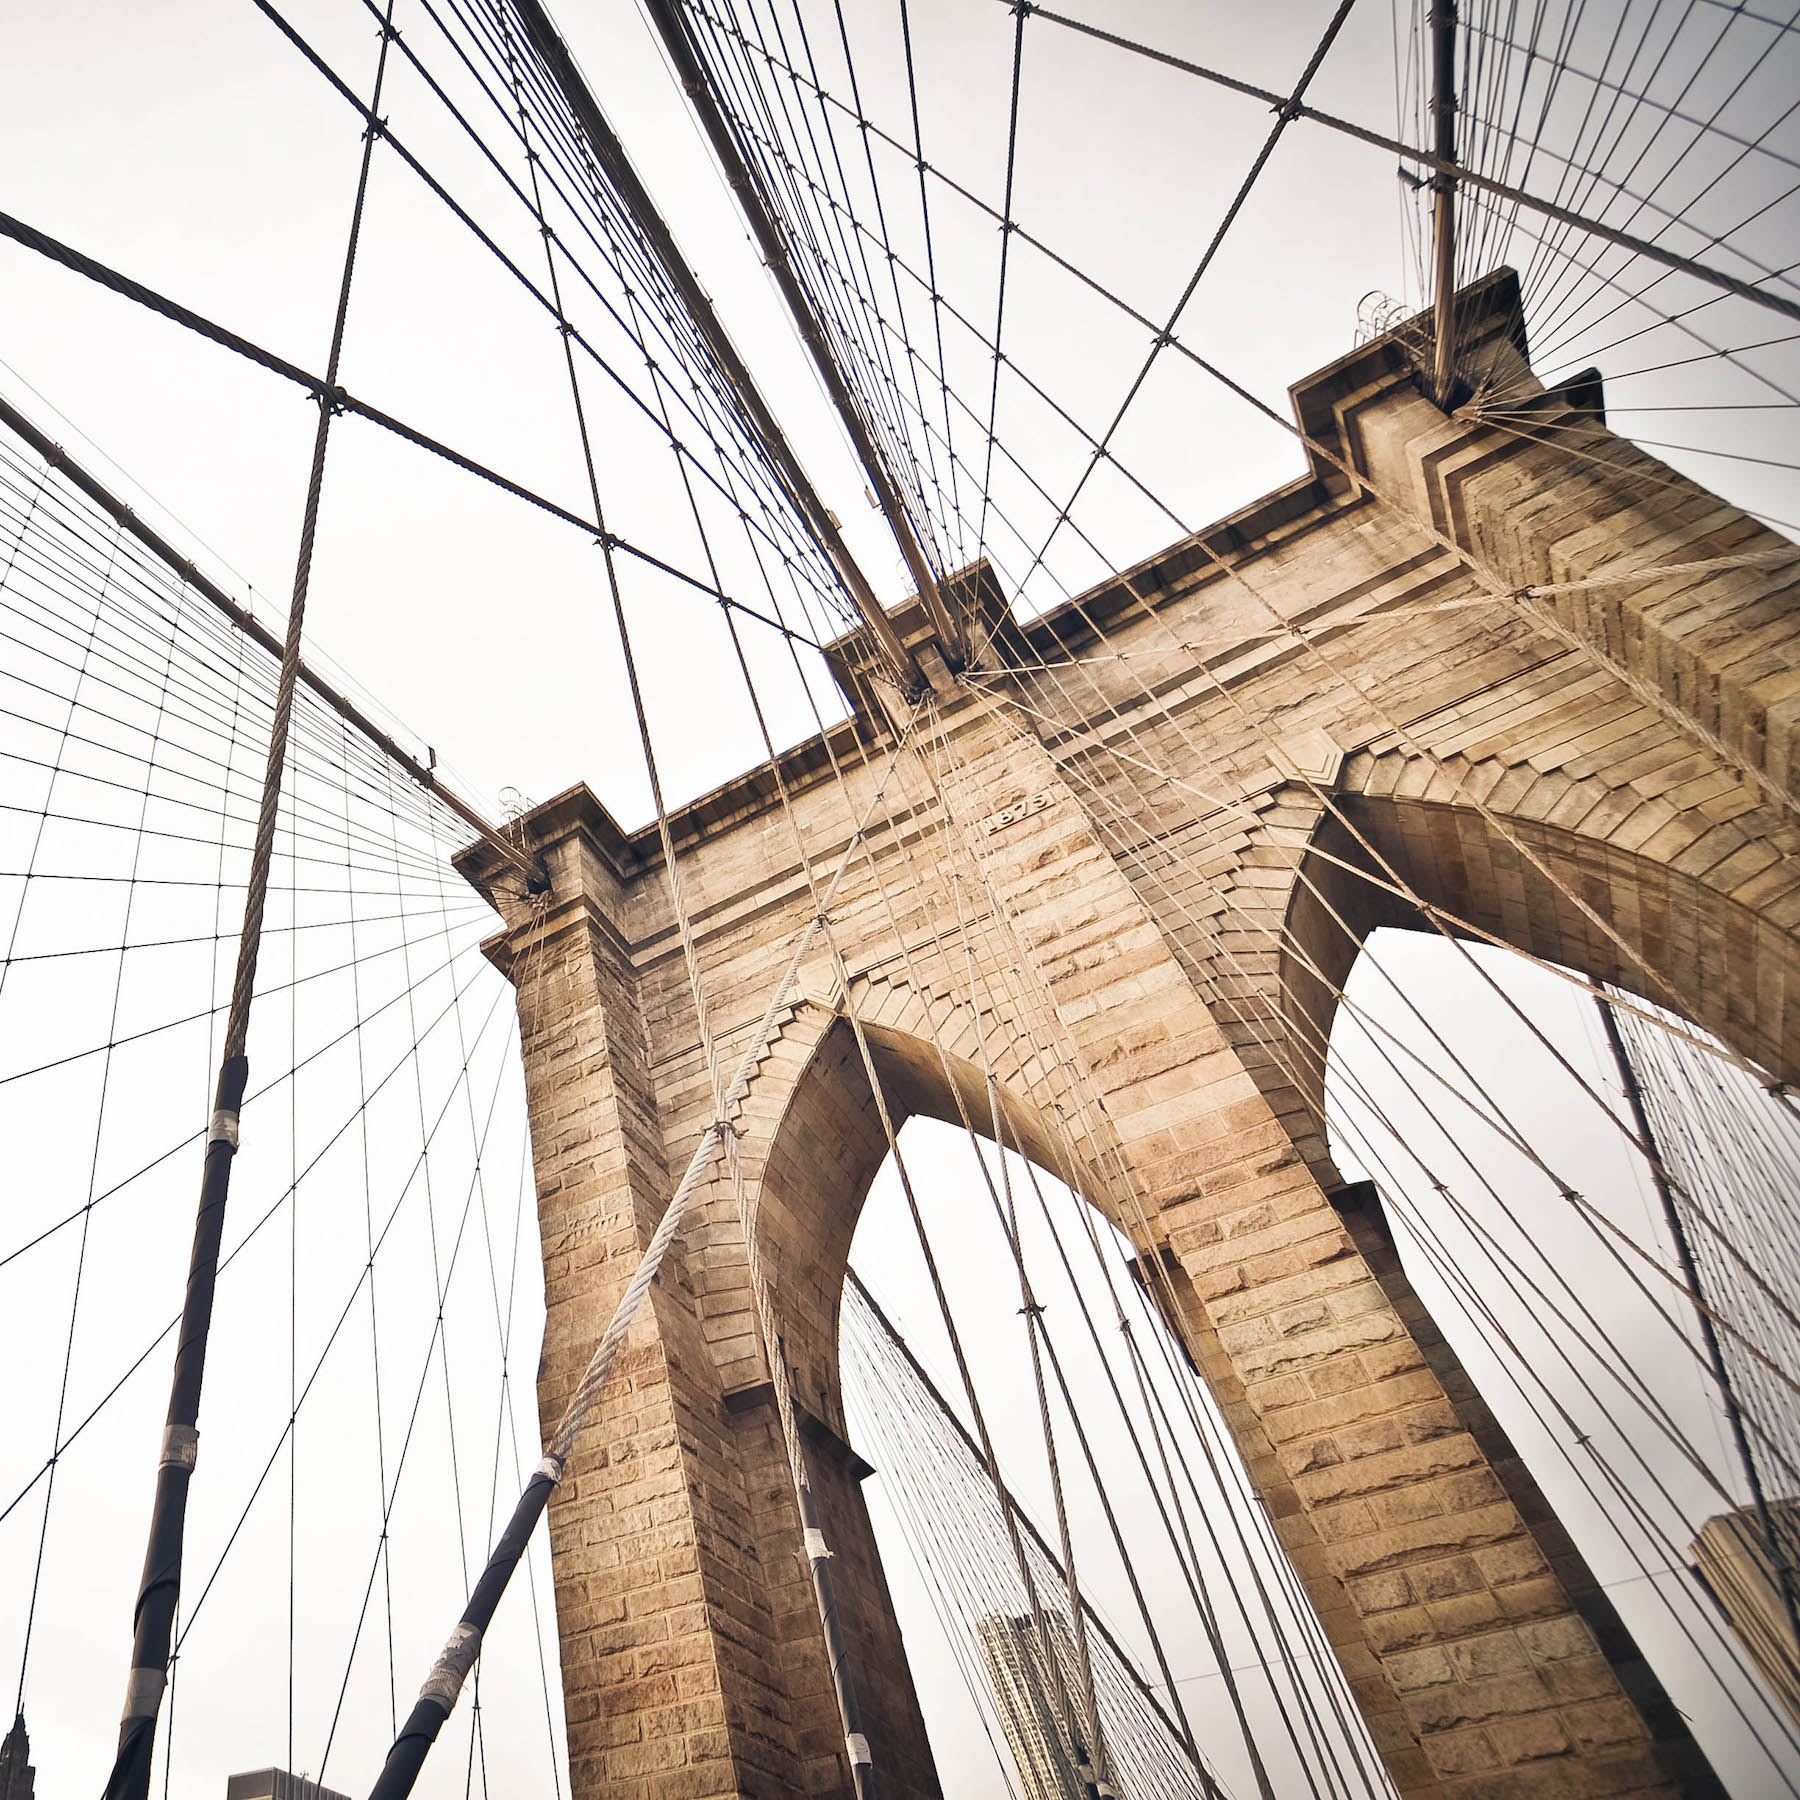 must-sees erste New York reise suelovesnyc_susan_fengler_nyc_blog_erste_new_york_reise_vita